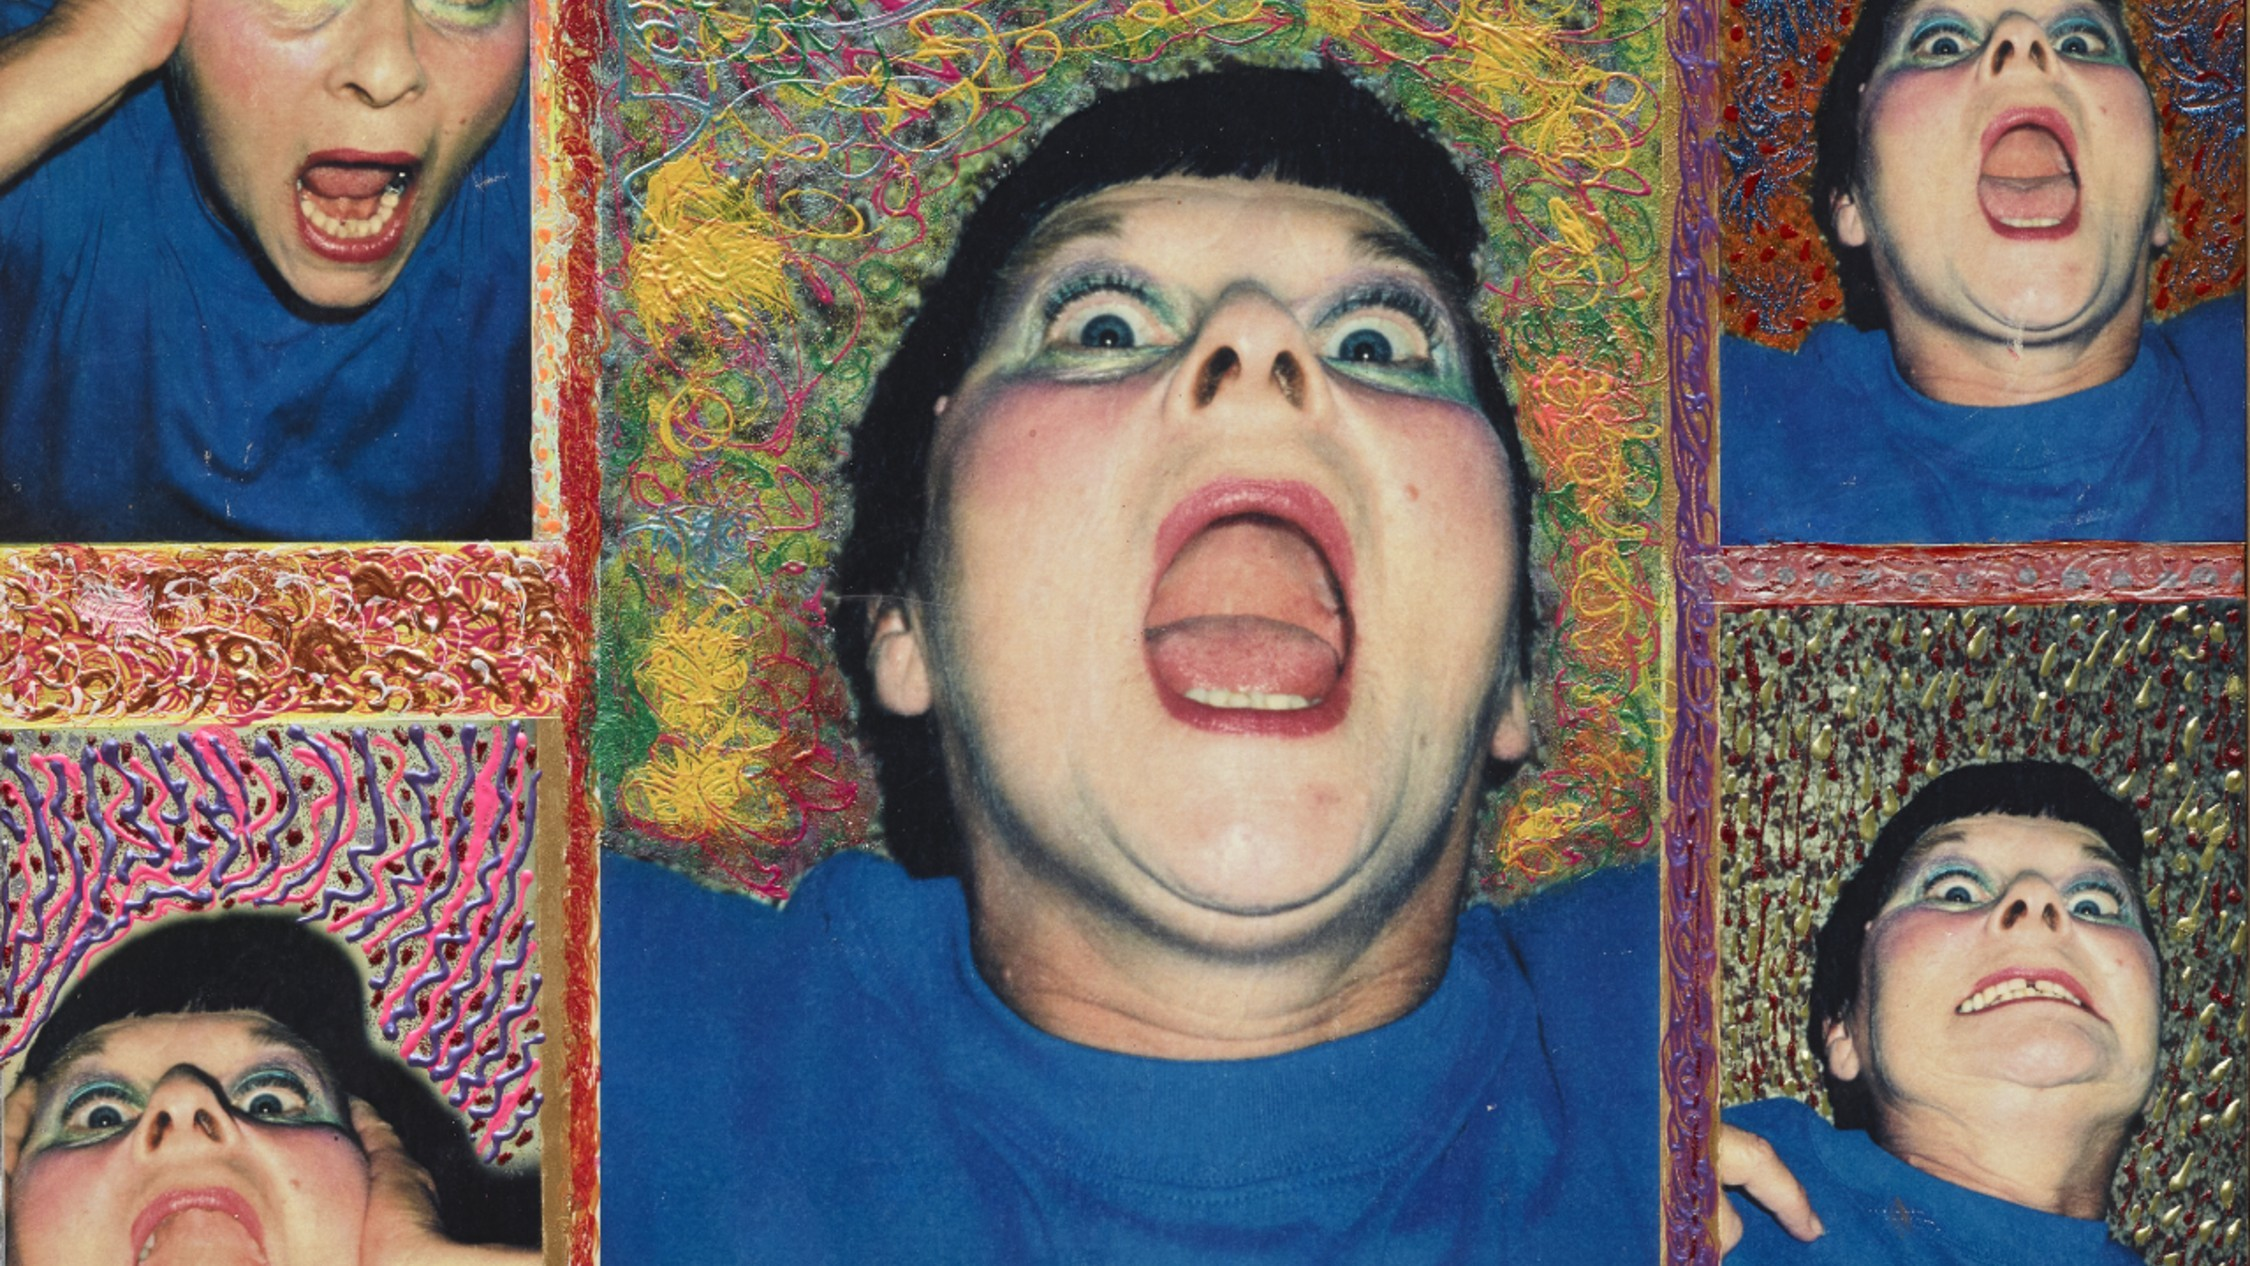 Patricia Larter 'Pat's anger' 1992